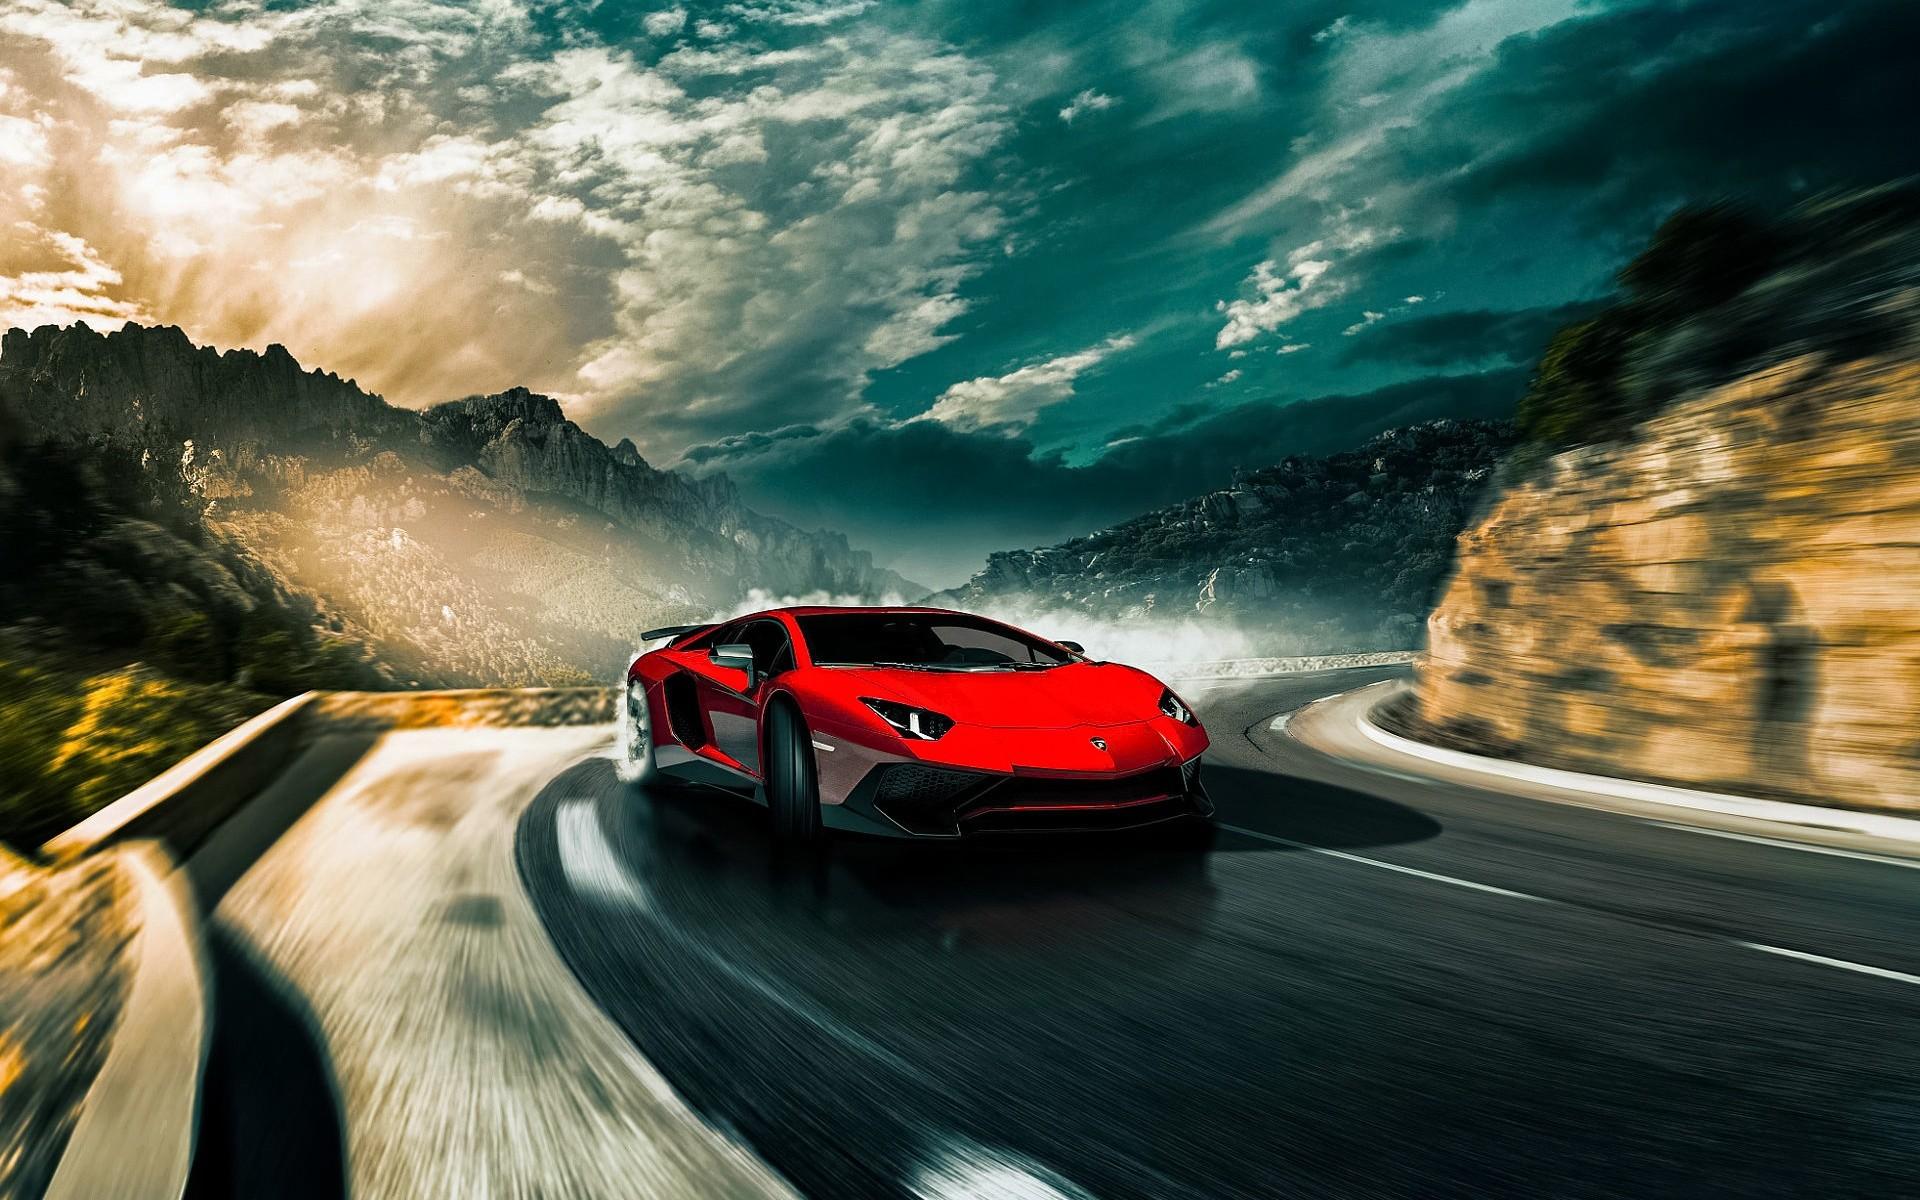 Lamborghini Wallpapers Hd 79 Pictures